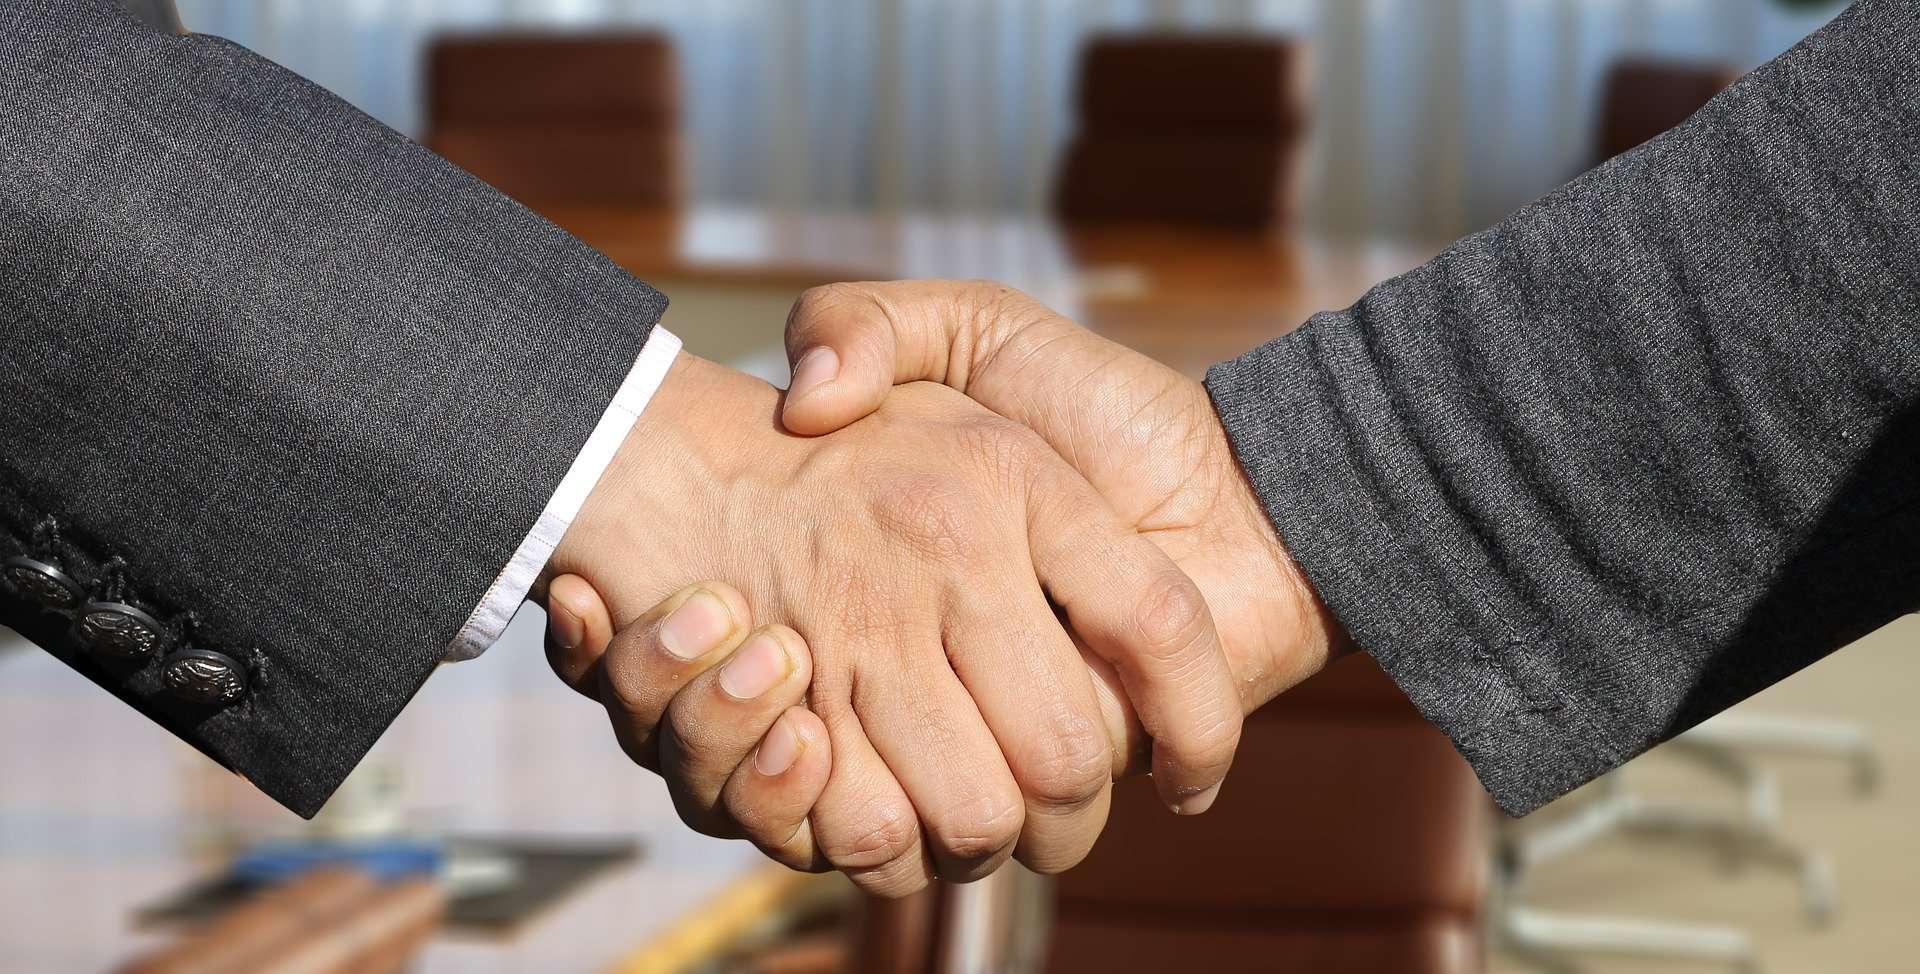 www.mydailyspanish.com Shaking Hands